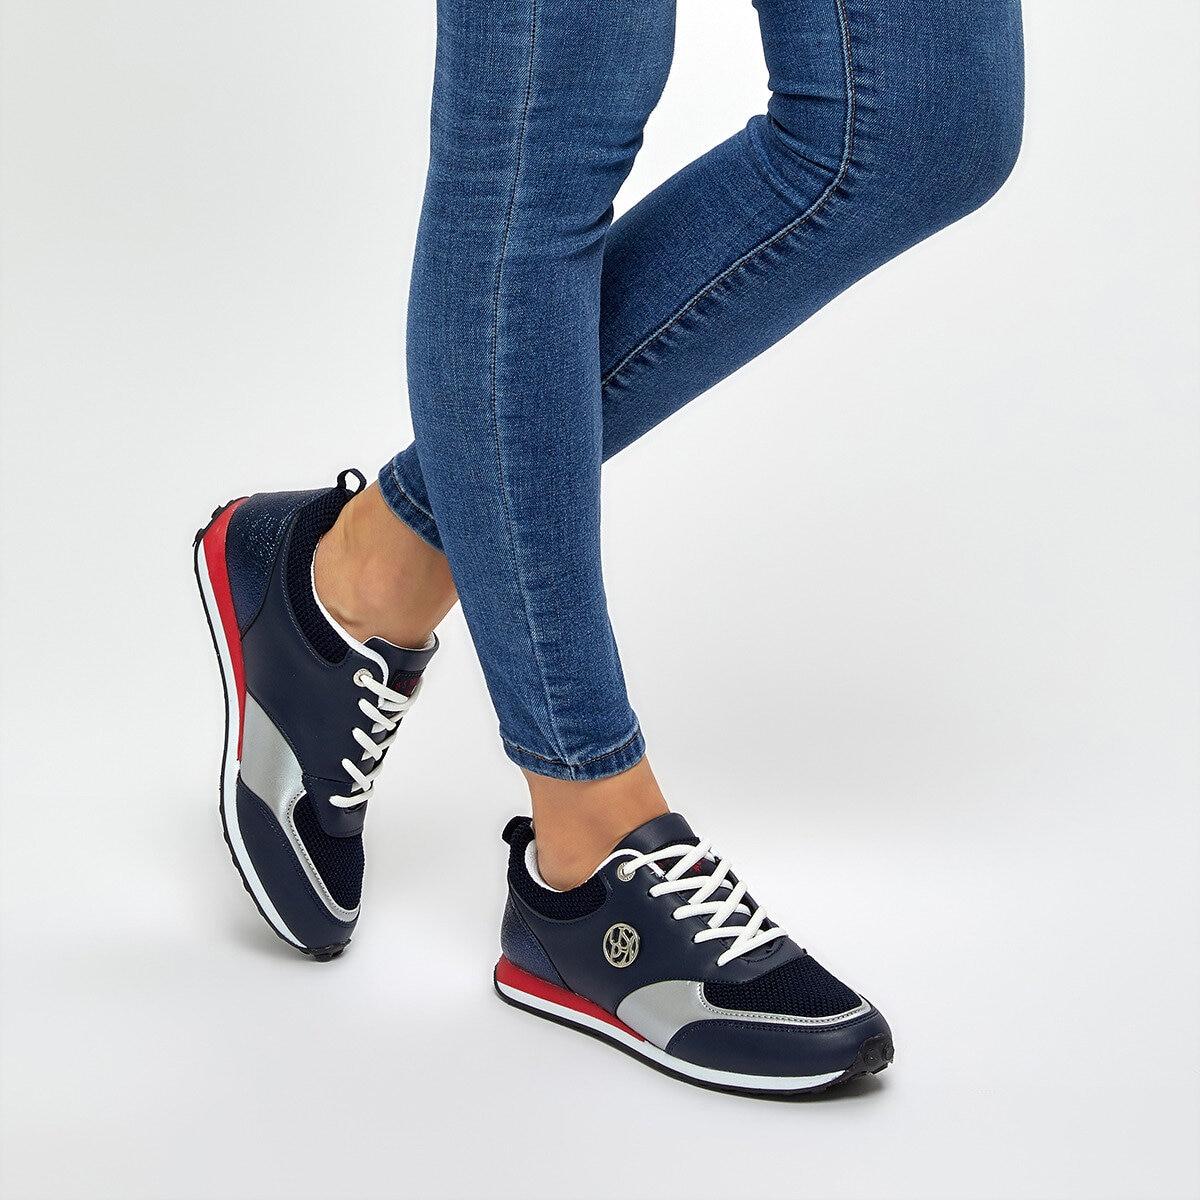 FLO ARES Navy Blue Women 'S Sneaker Shoes U.S. POLO ASSN.